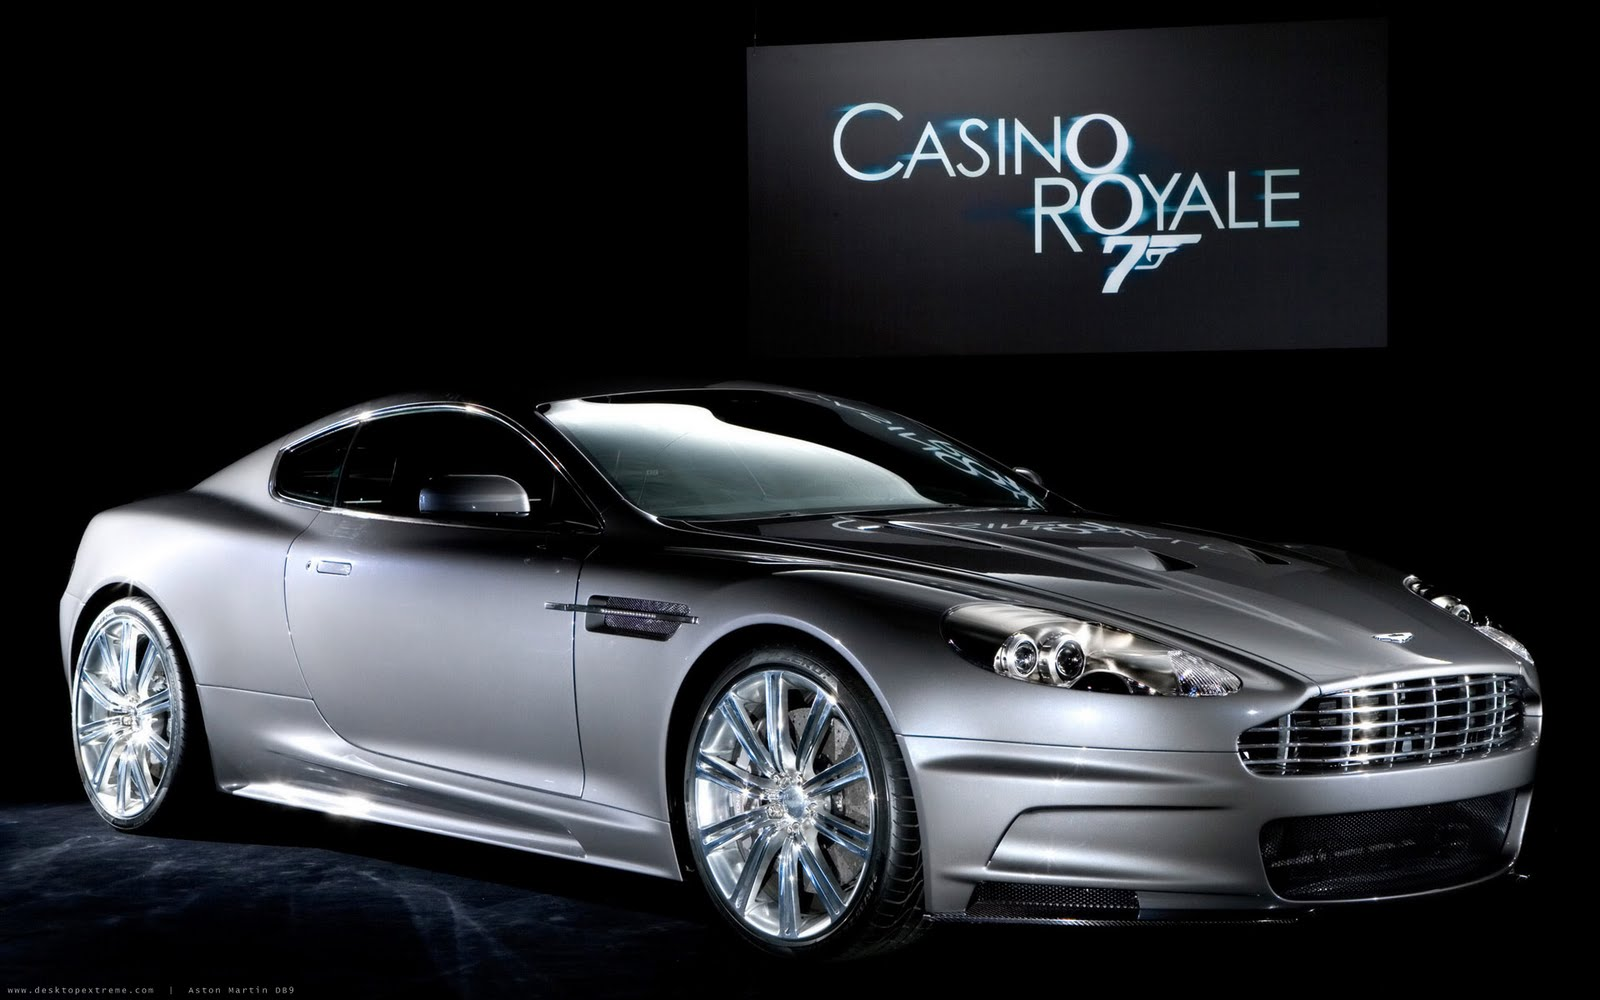 http://4.bp.blogspot.com/-iYqXrYNJtQc/TeQTBWSMx8I/AAAAAAAABE8/1lXaGM3Dw3g/s1600/Aston_Martin_DBS_Widescreen_Casino_Royale_926200650659PM23.jpg